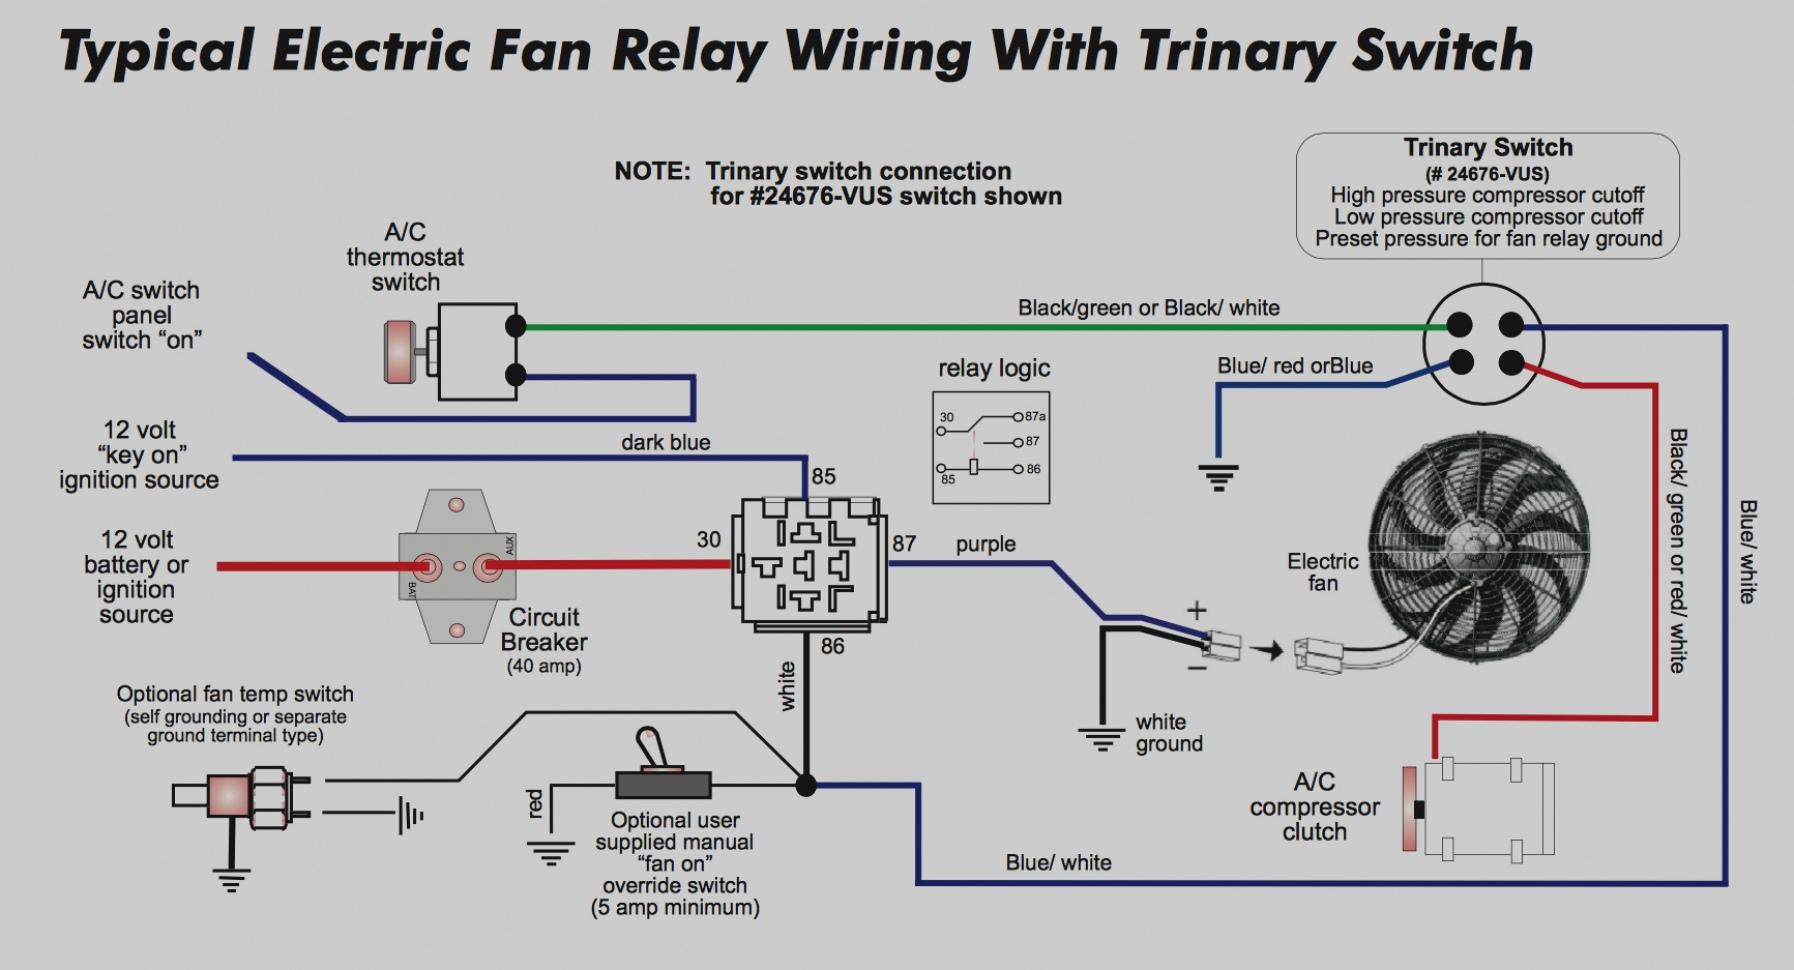 Honda Gx340 Starter Wiring Diagram | Wiring Library - Honda Gx160 Electric Start Wiring Diagram